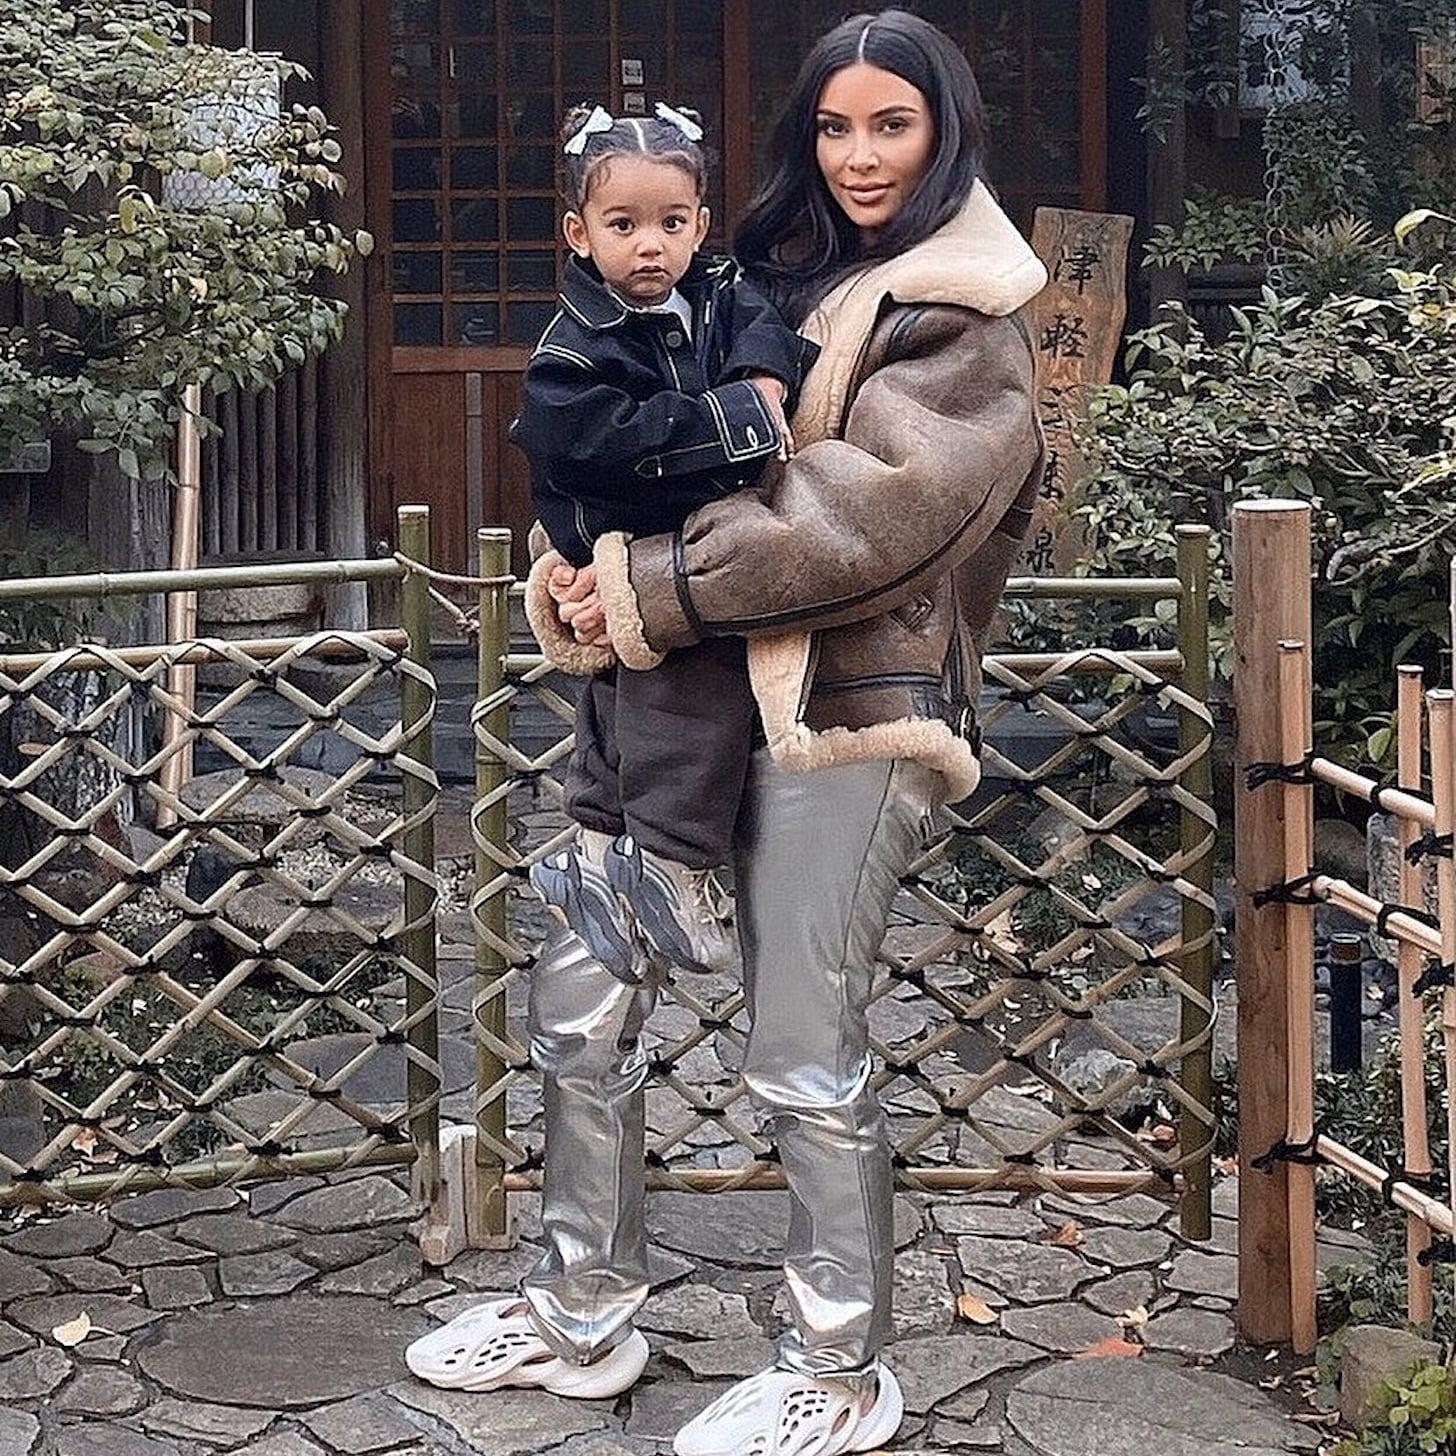 Kim Kardashian's Wild Yeezy Foam Runner